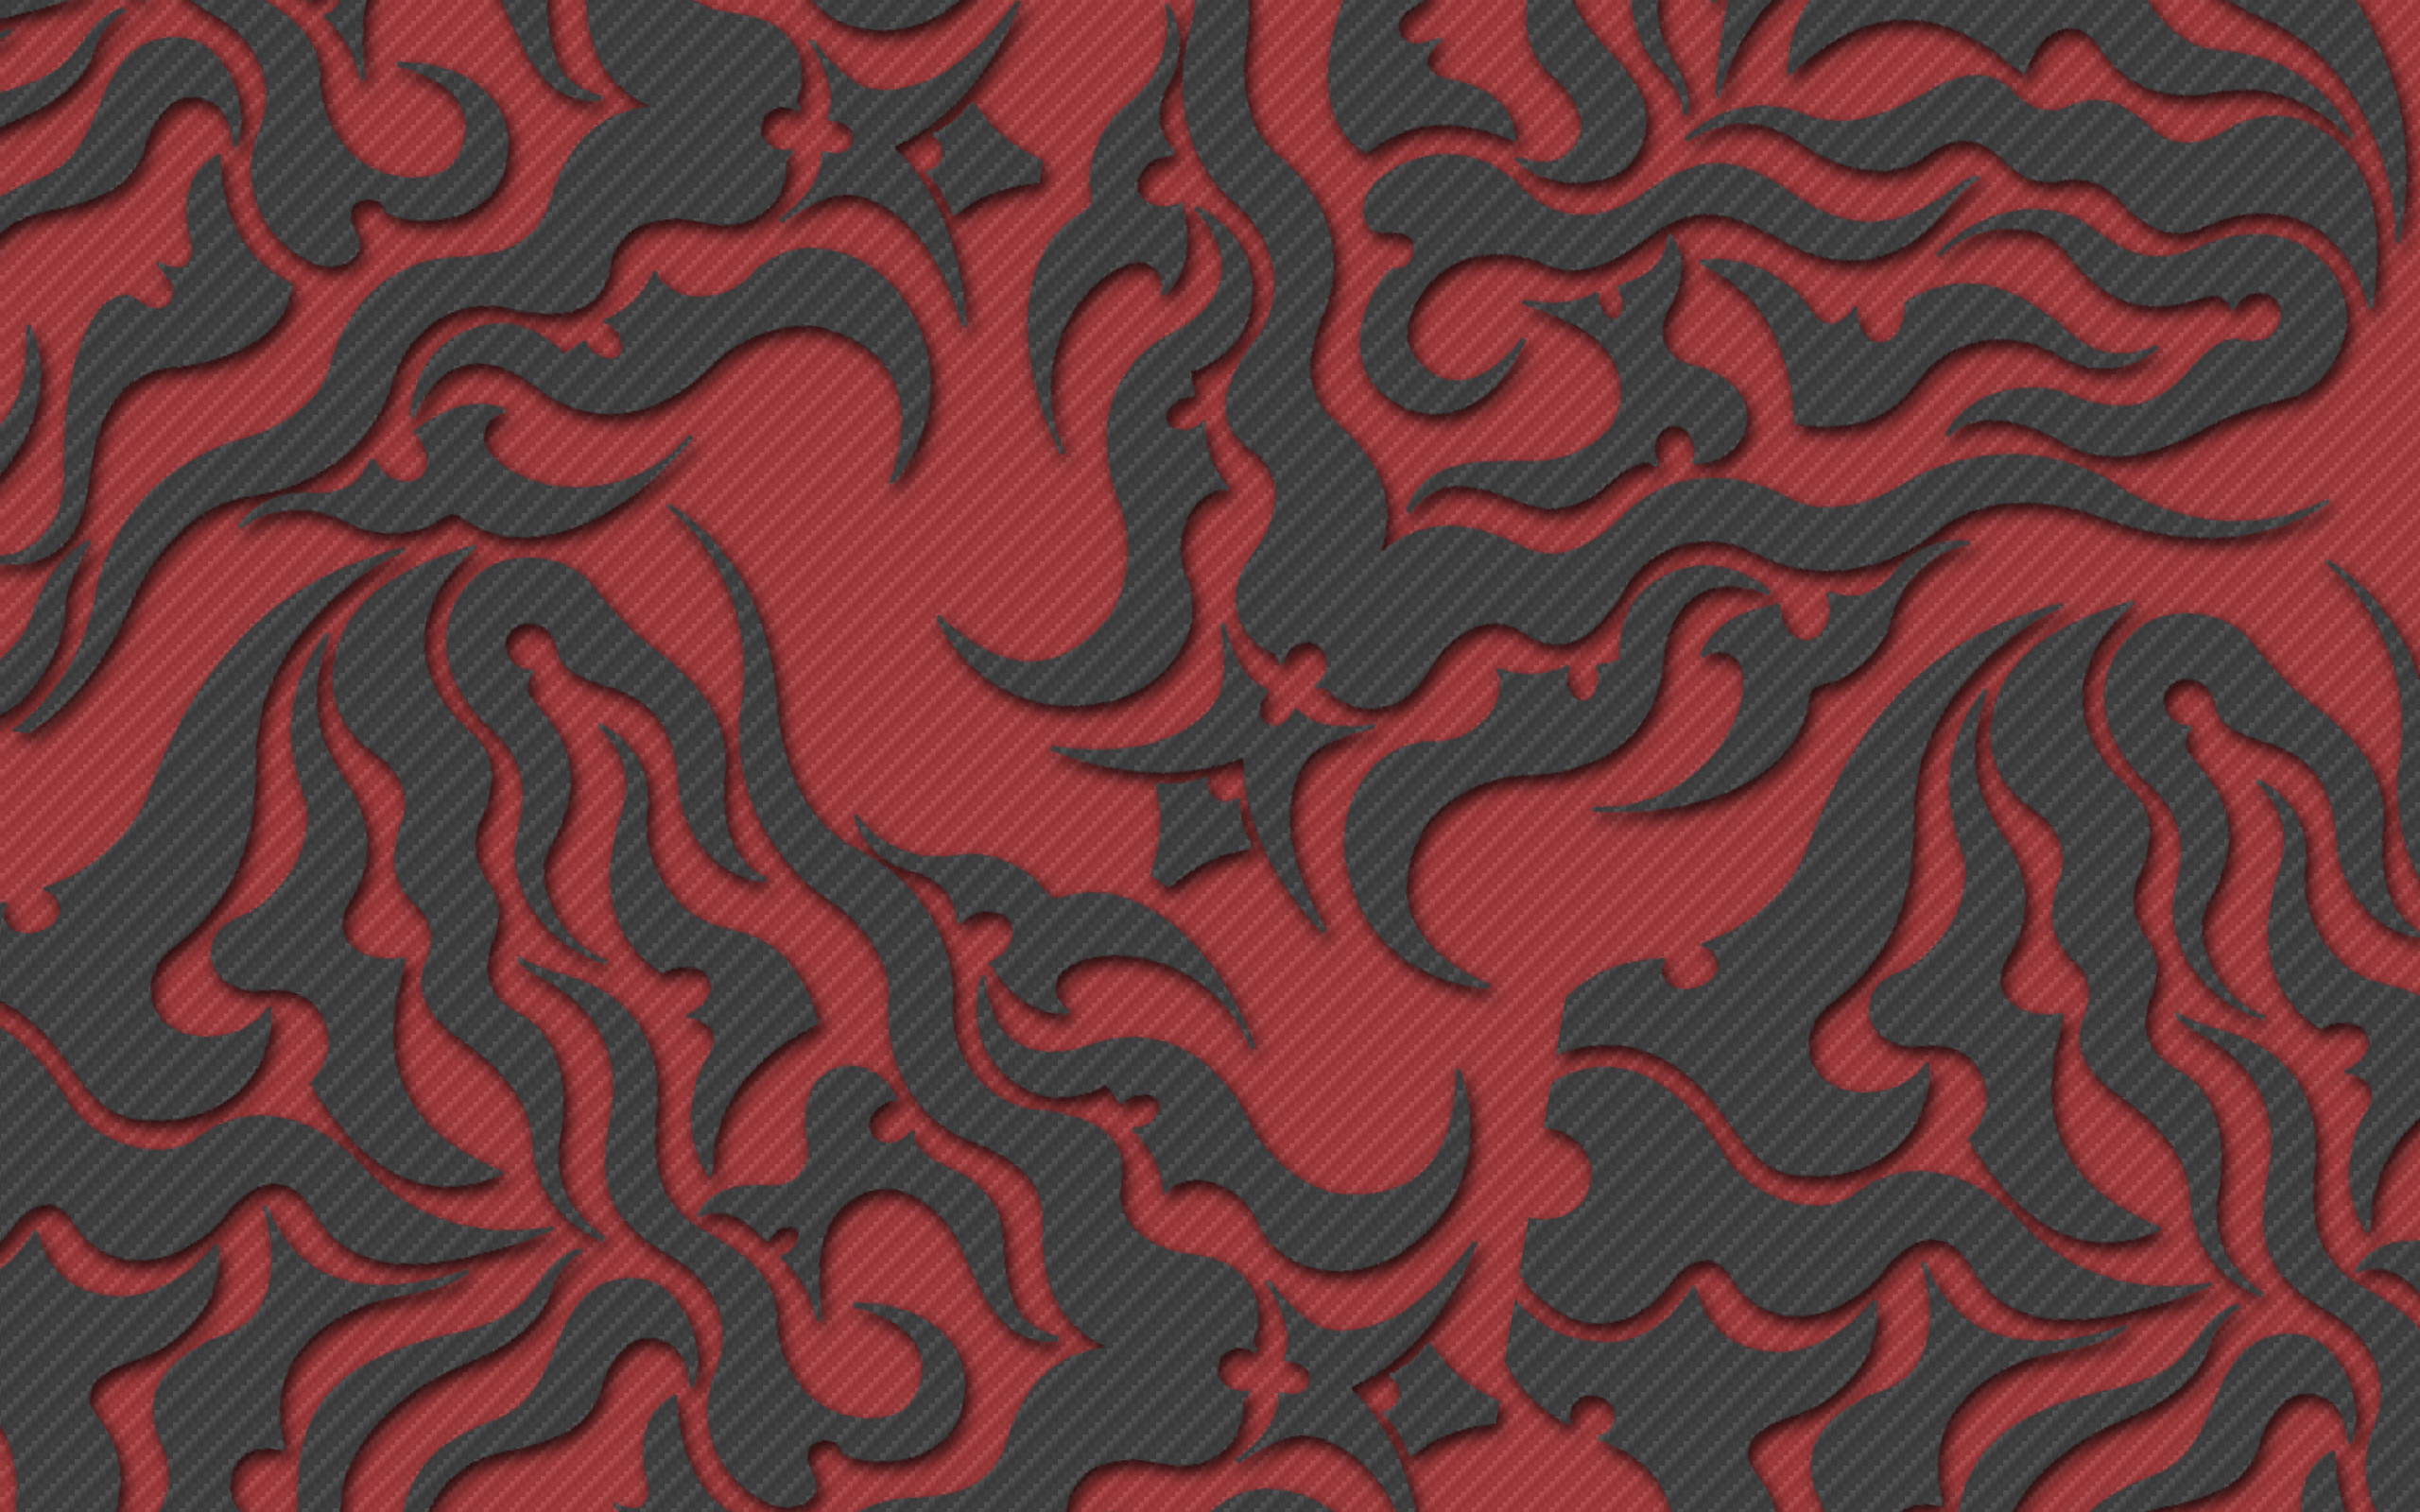 Hd Tribal Wallpapers: Tribal Design Wallpapers ·① WallpaperTag